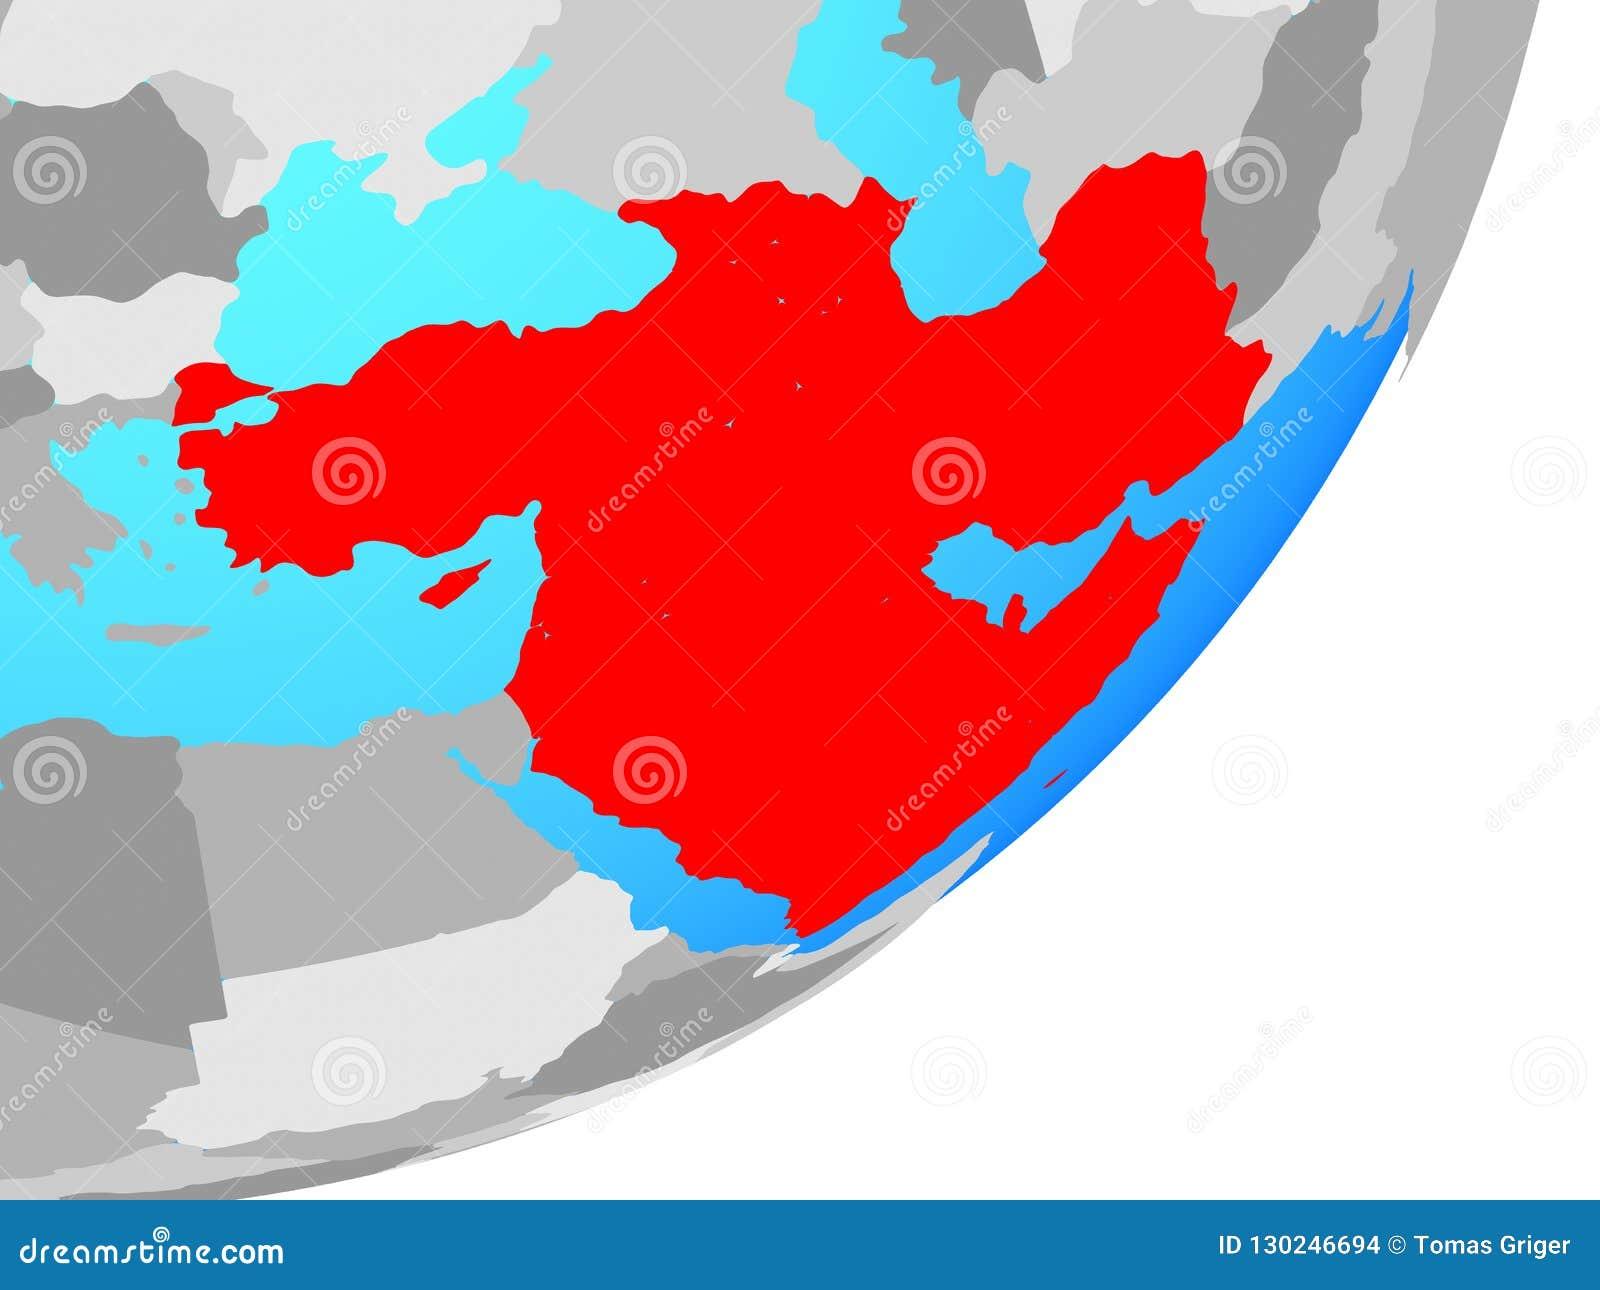 Map Of Western Asia On Globe Stock Illustration - Illustration of ...